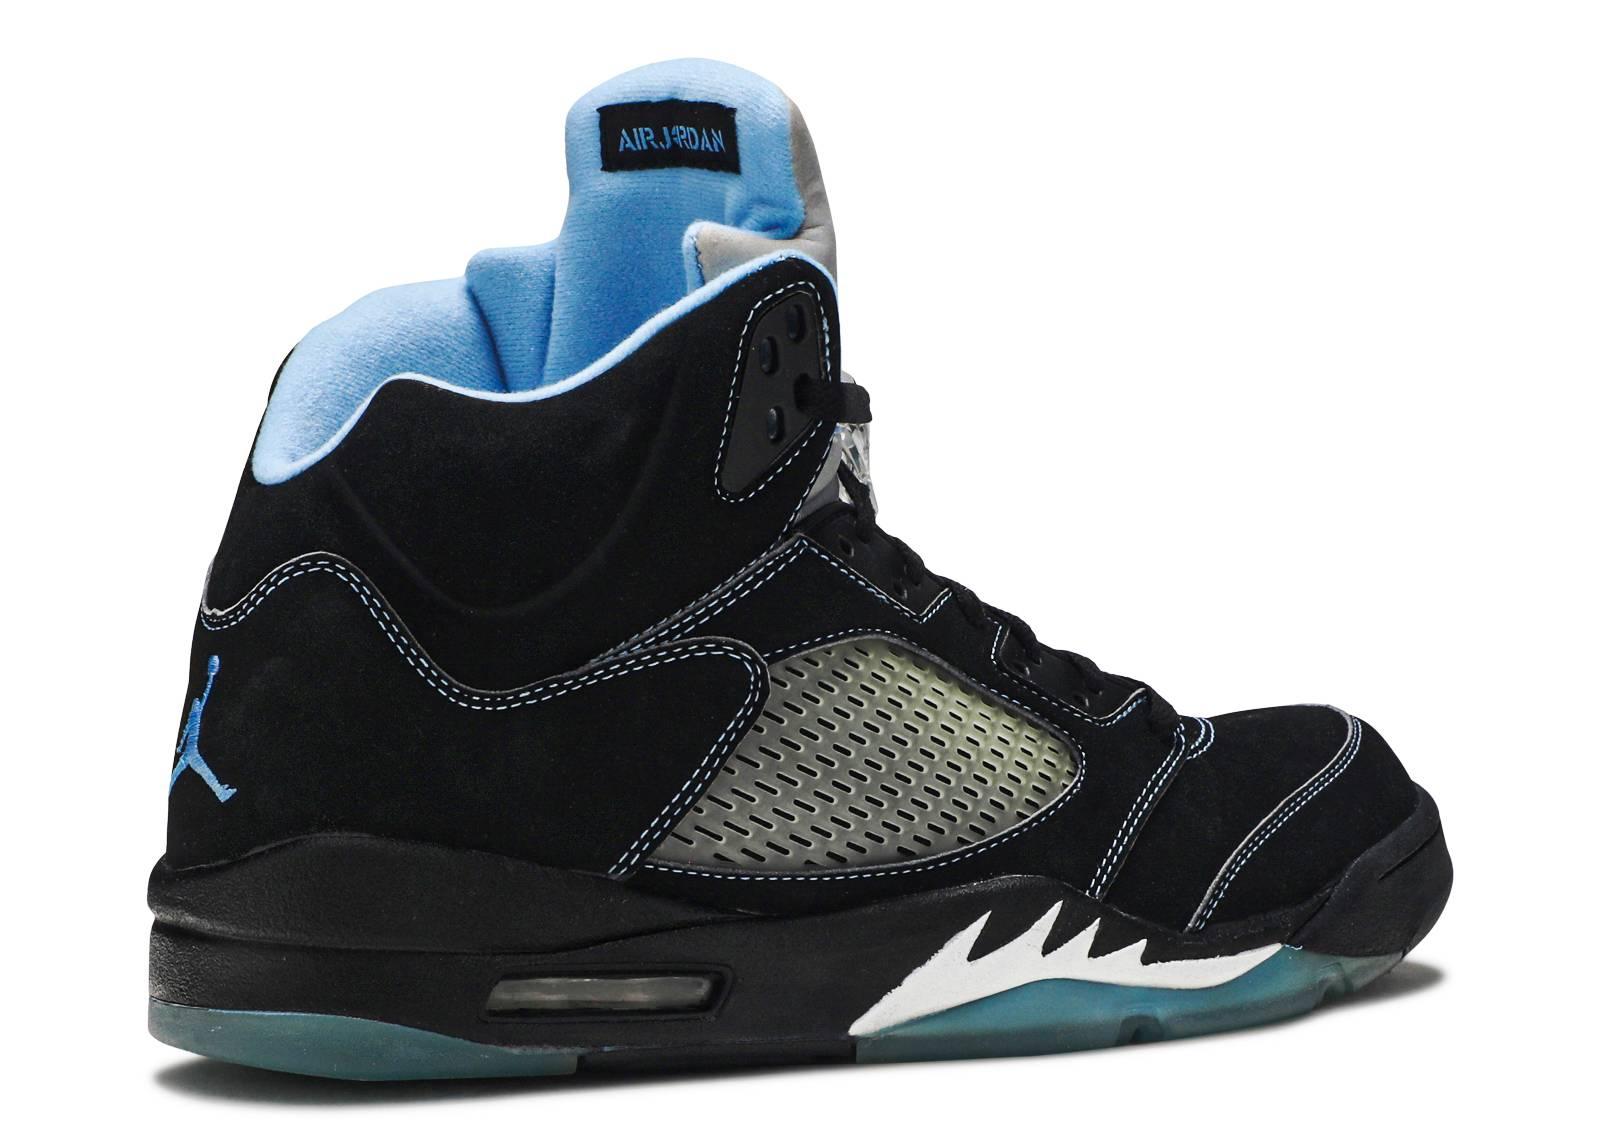 online store cae87 9f185 Air Jordan 5 Retro Black University Blue Silver shoes